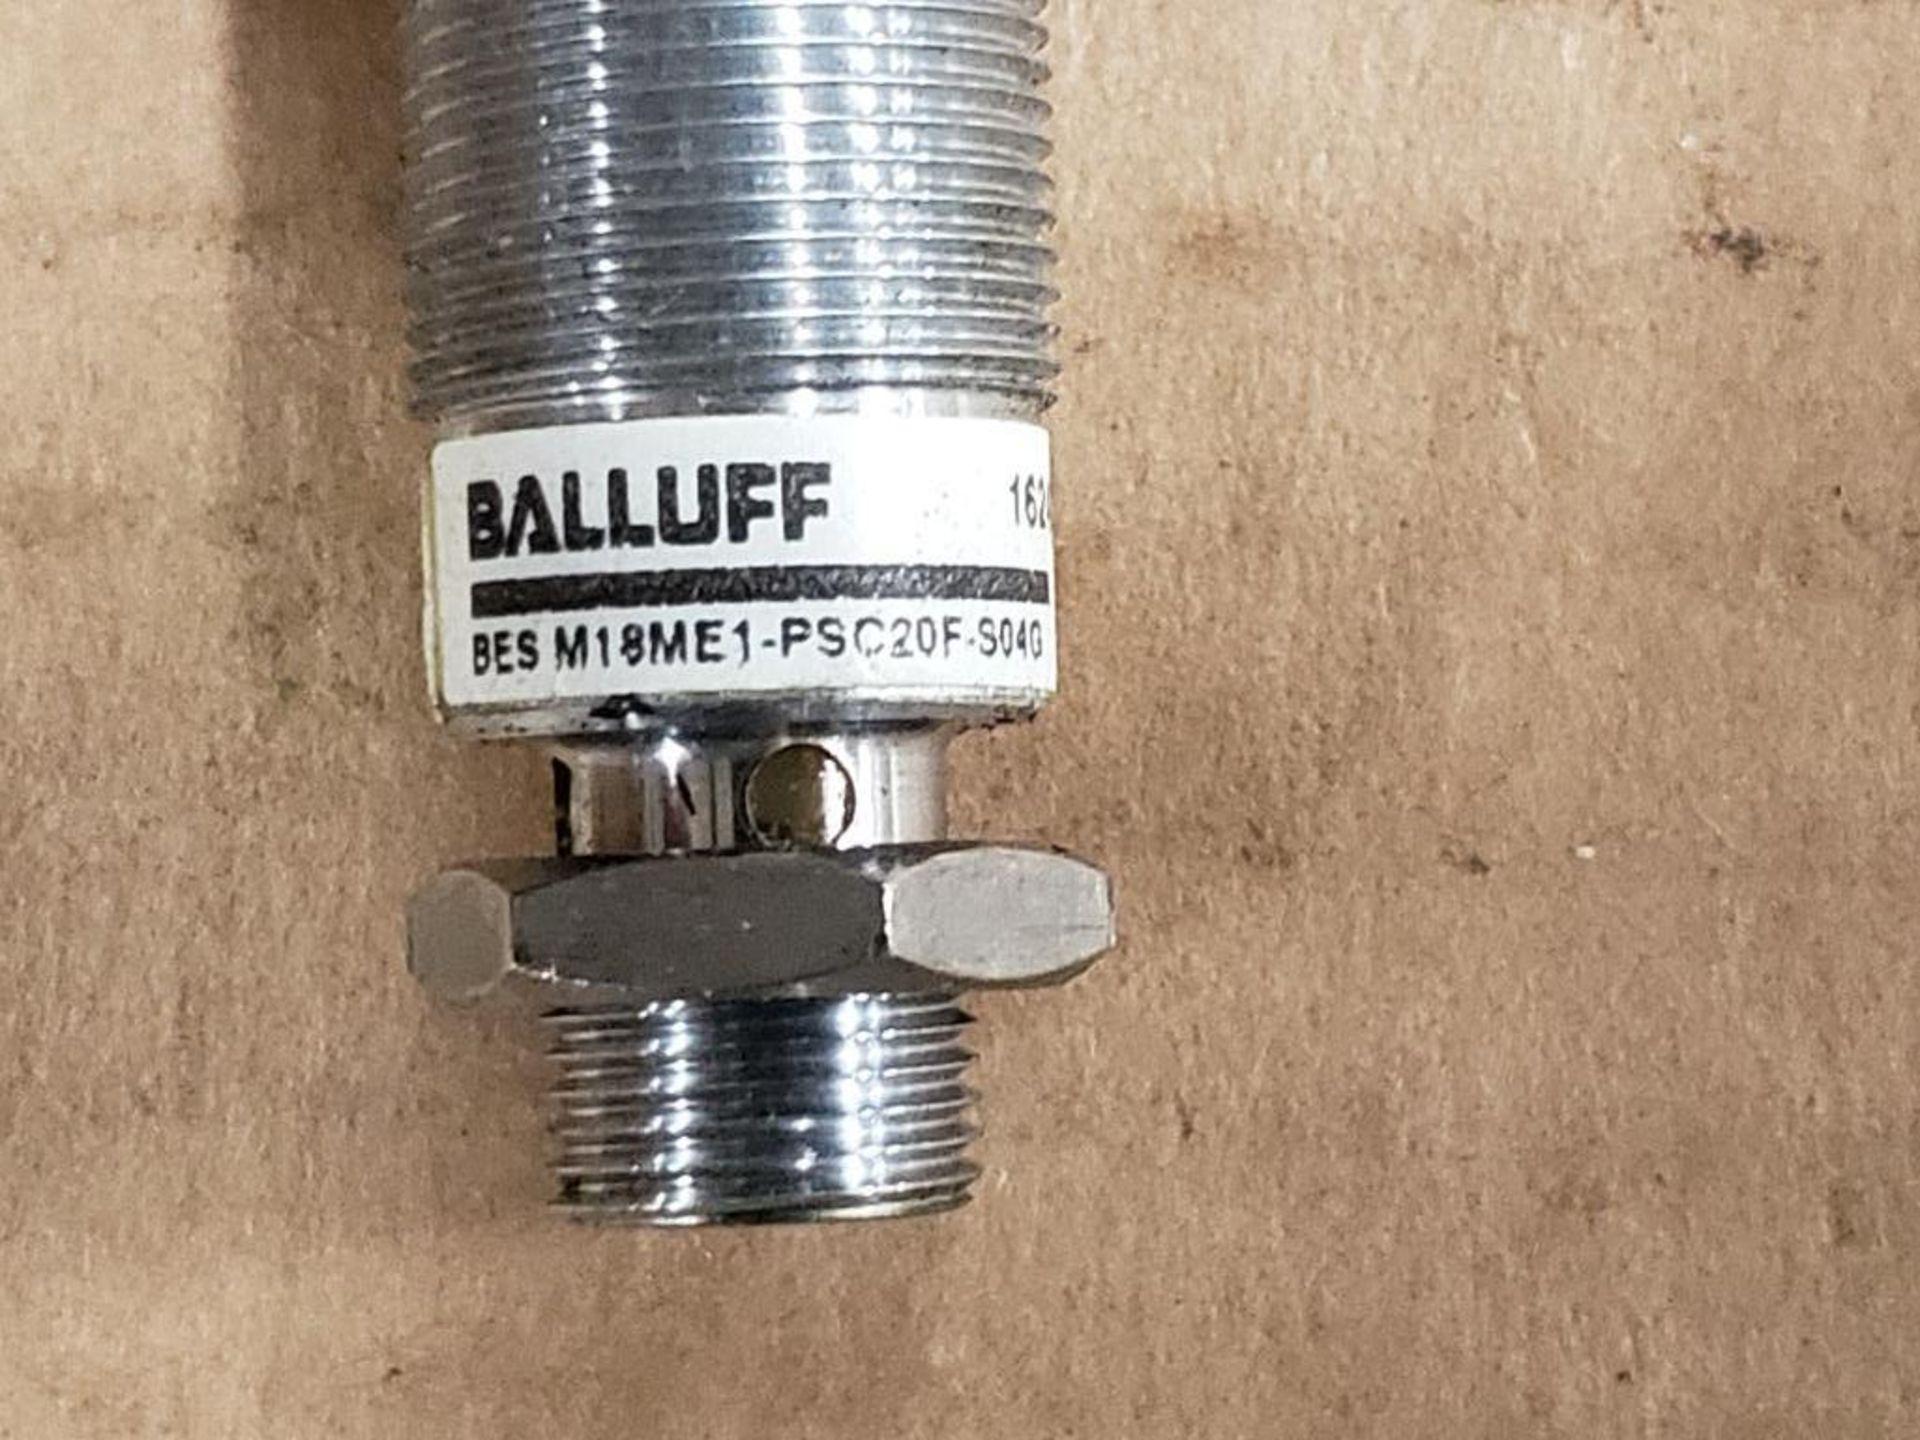 Qty 10 - Assorted electrical sensor. Balluff, IFM. - Image 7 of 12